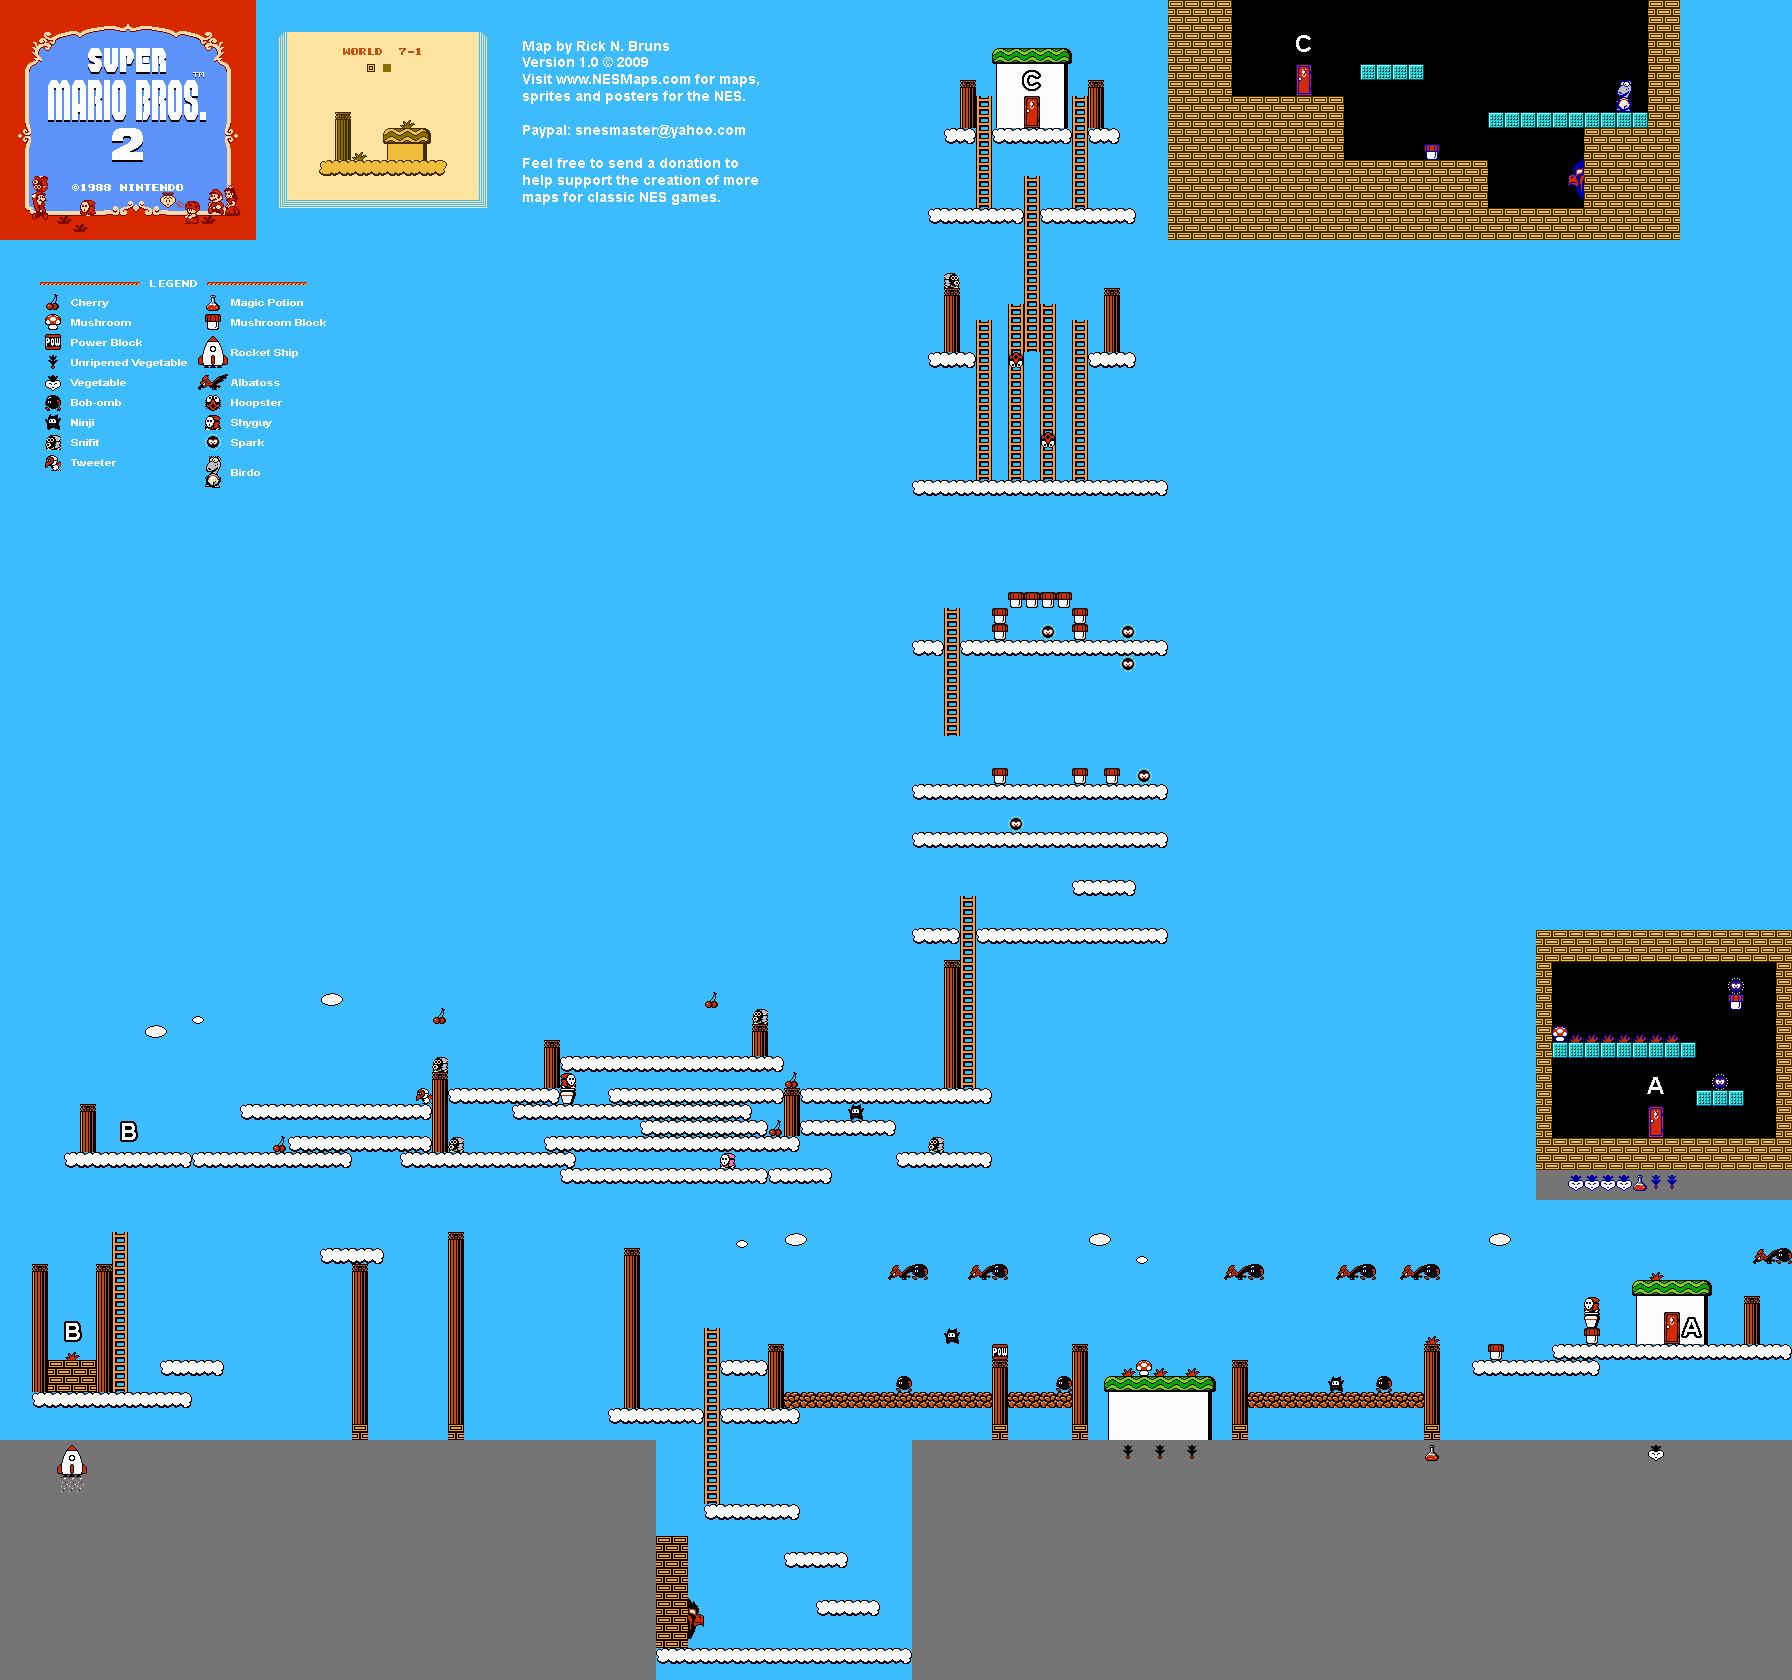 Super Mario Brothers 2 - World 7-1 Nintendo NES Map